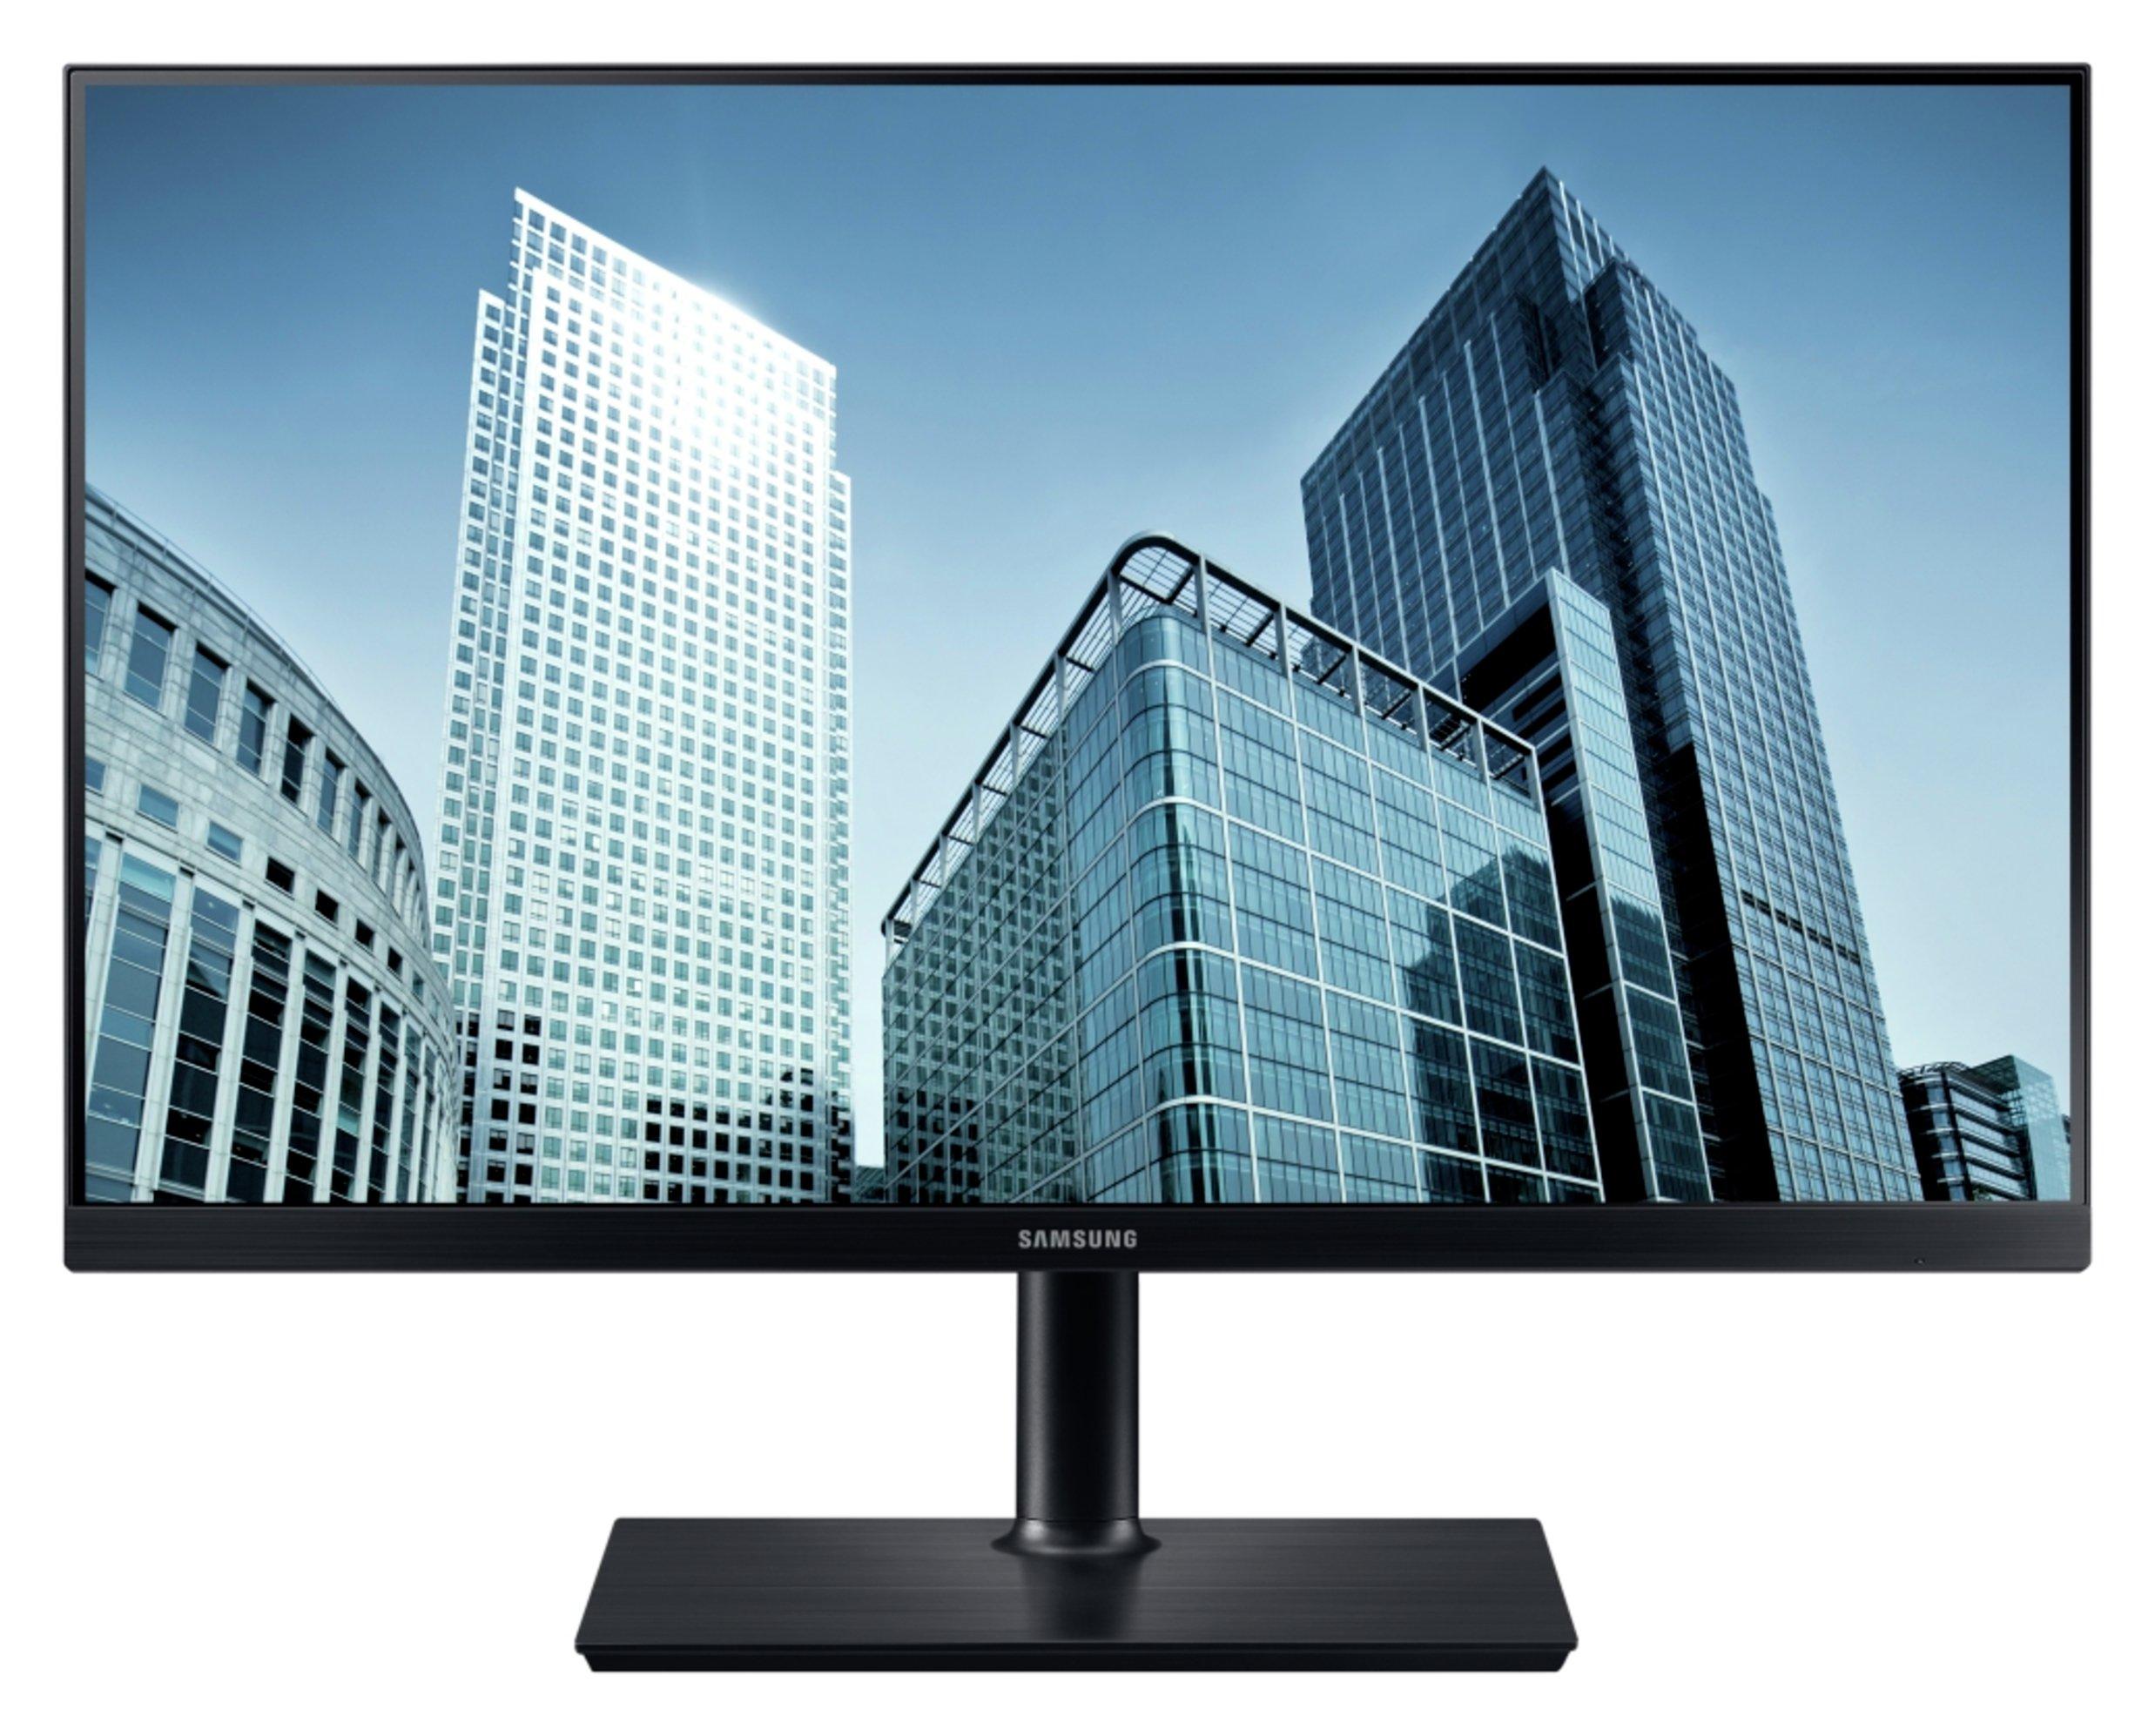 Samsung S27H850 WQHD 27 Inch LED Monitor